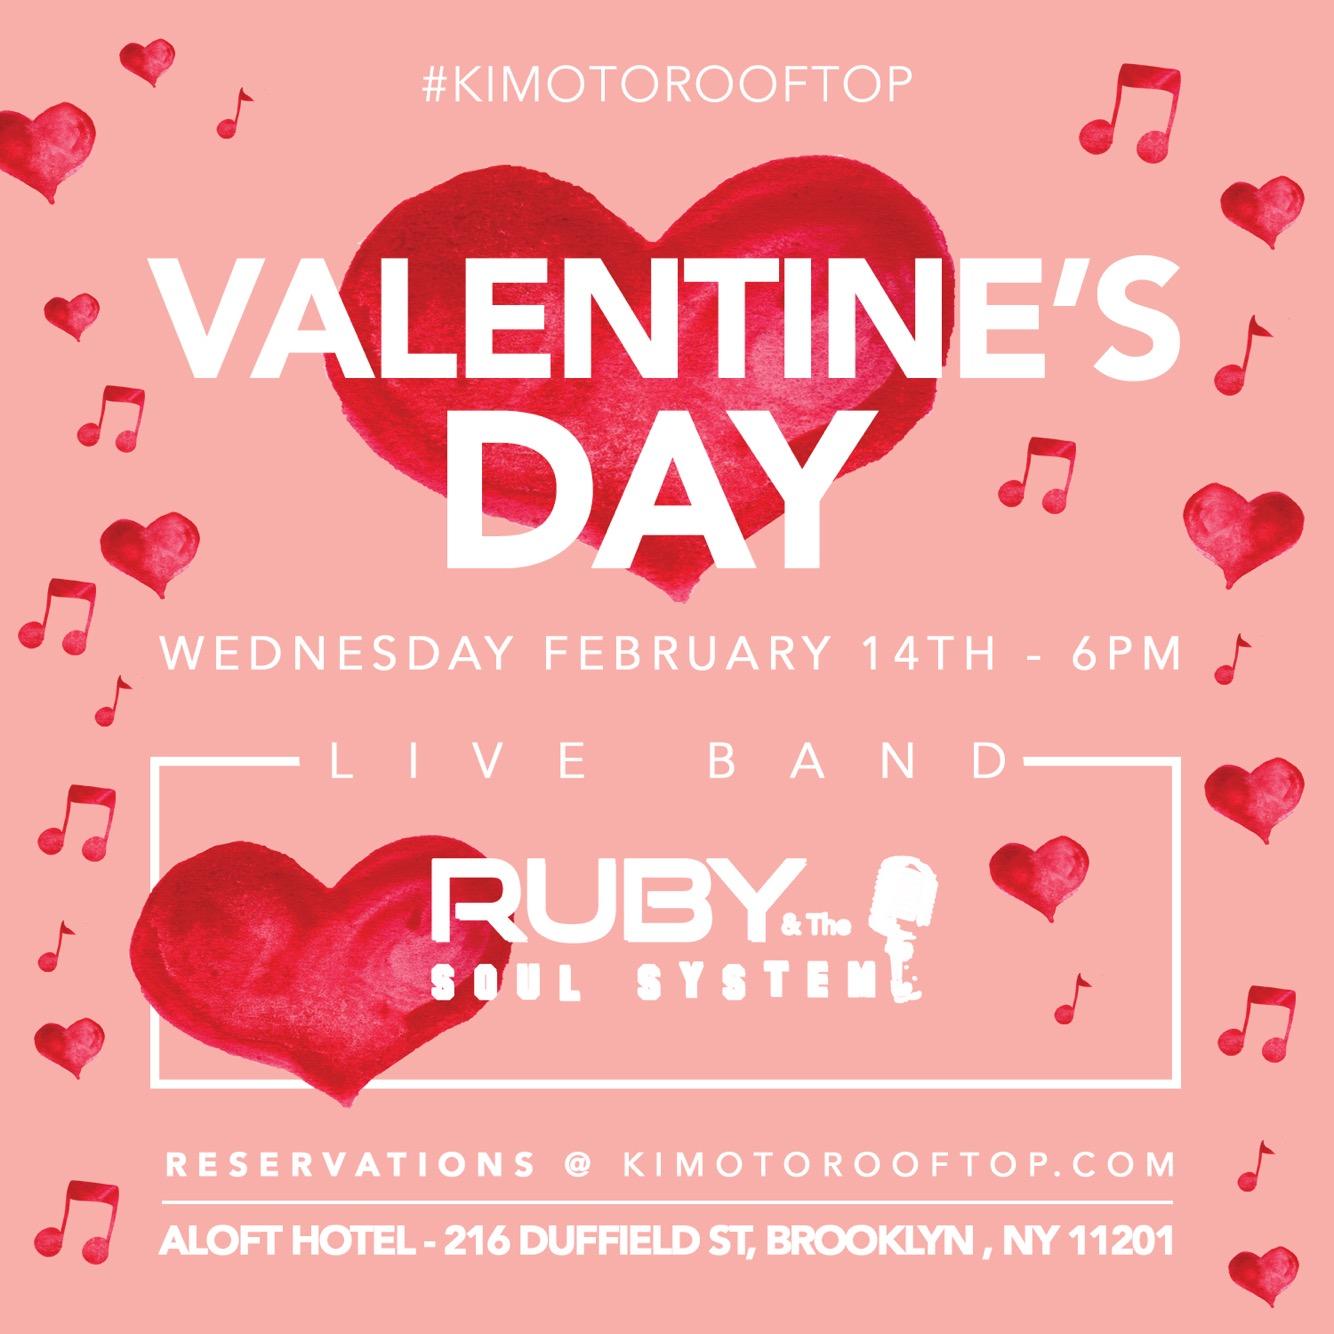 Kimoto Valentines Day Feb 14 2018 Aloft Sheraton Brooklyn.jpg